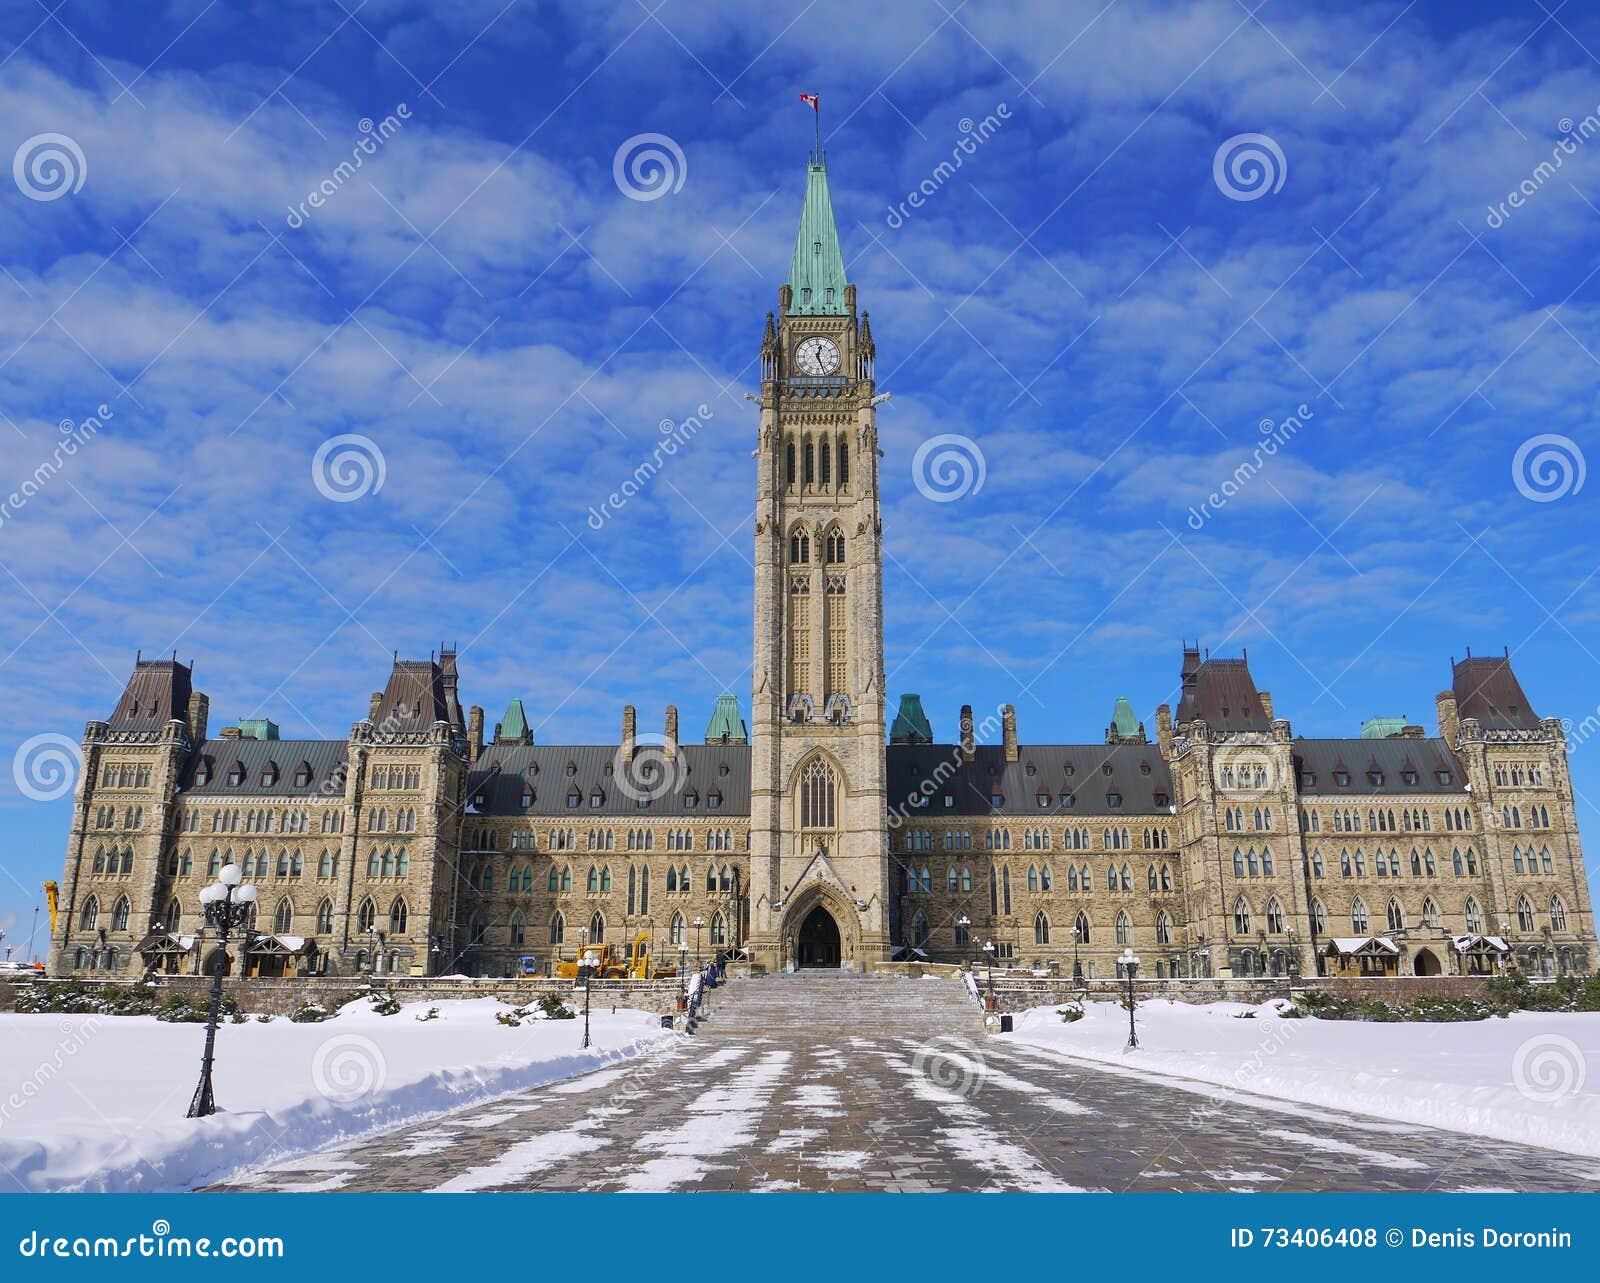 Ottawa parliament in winter time